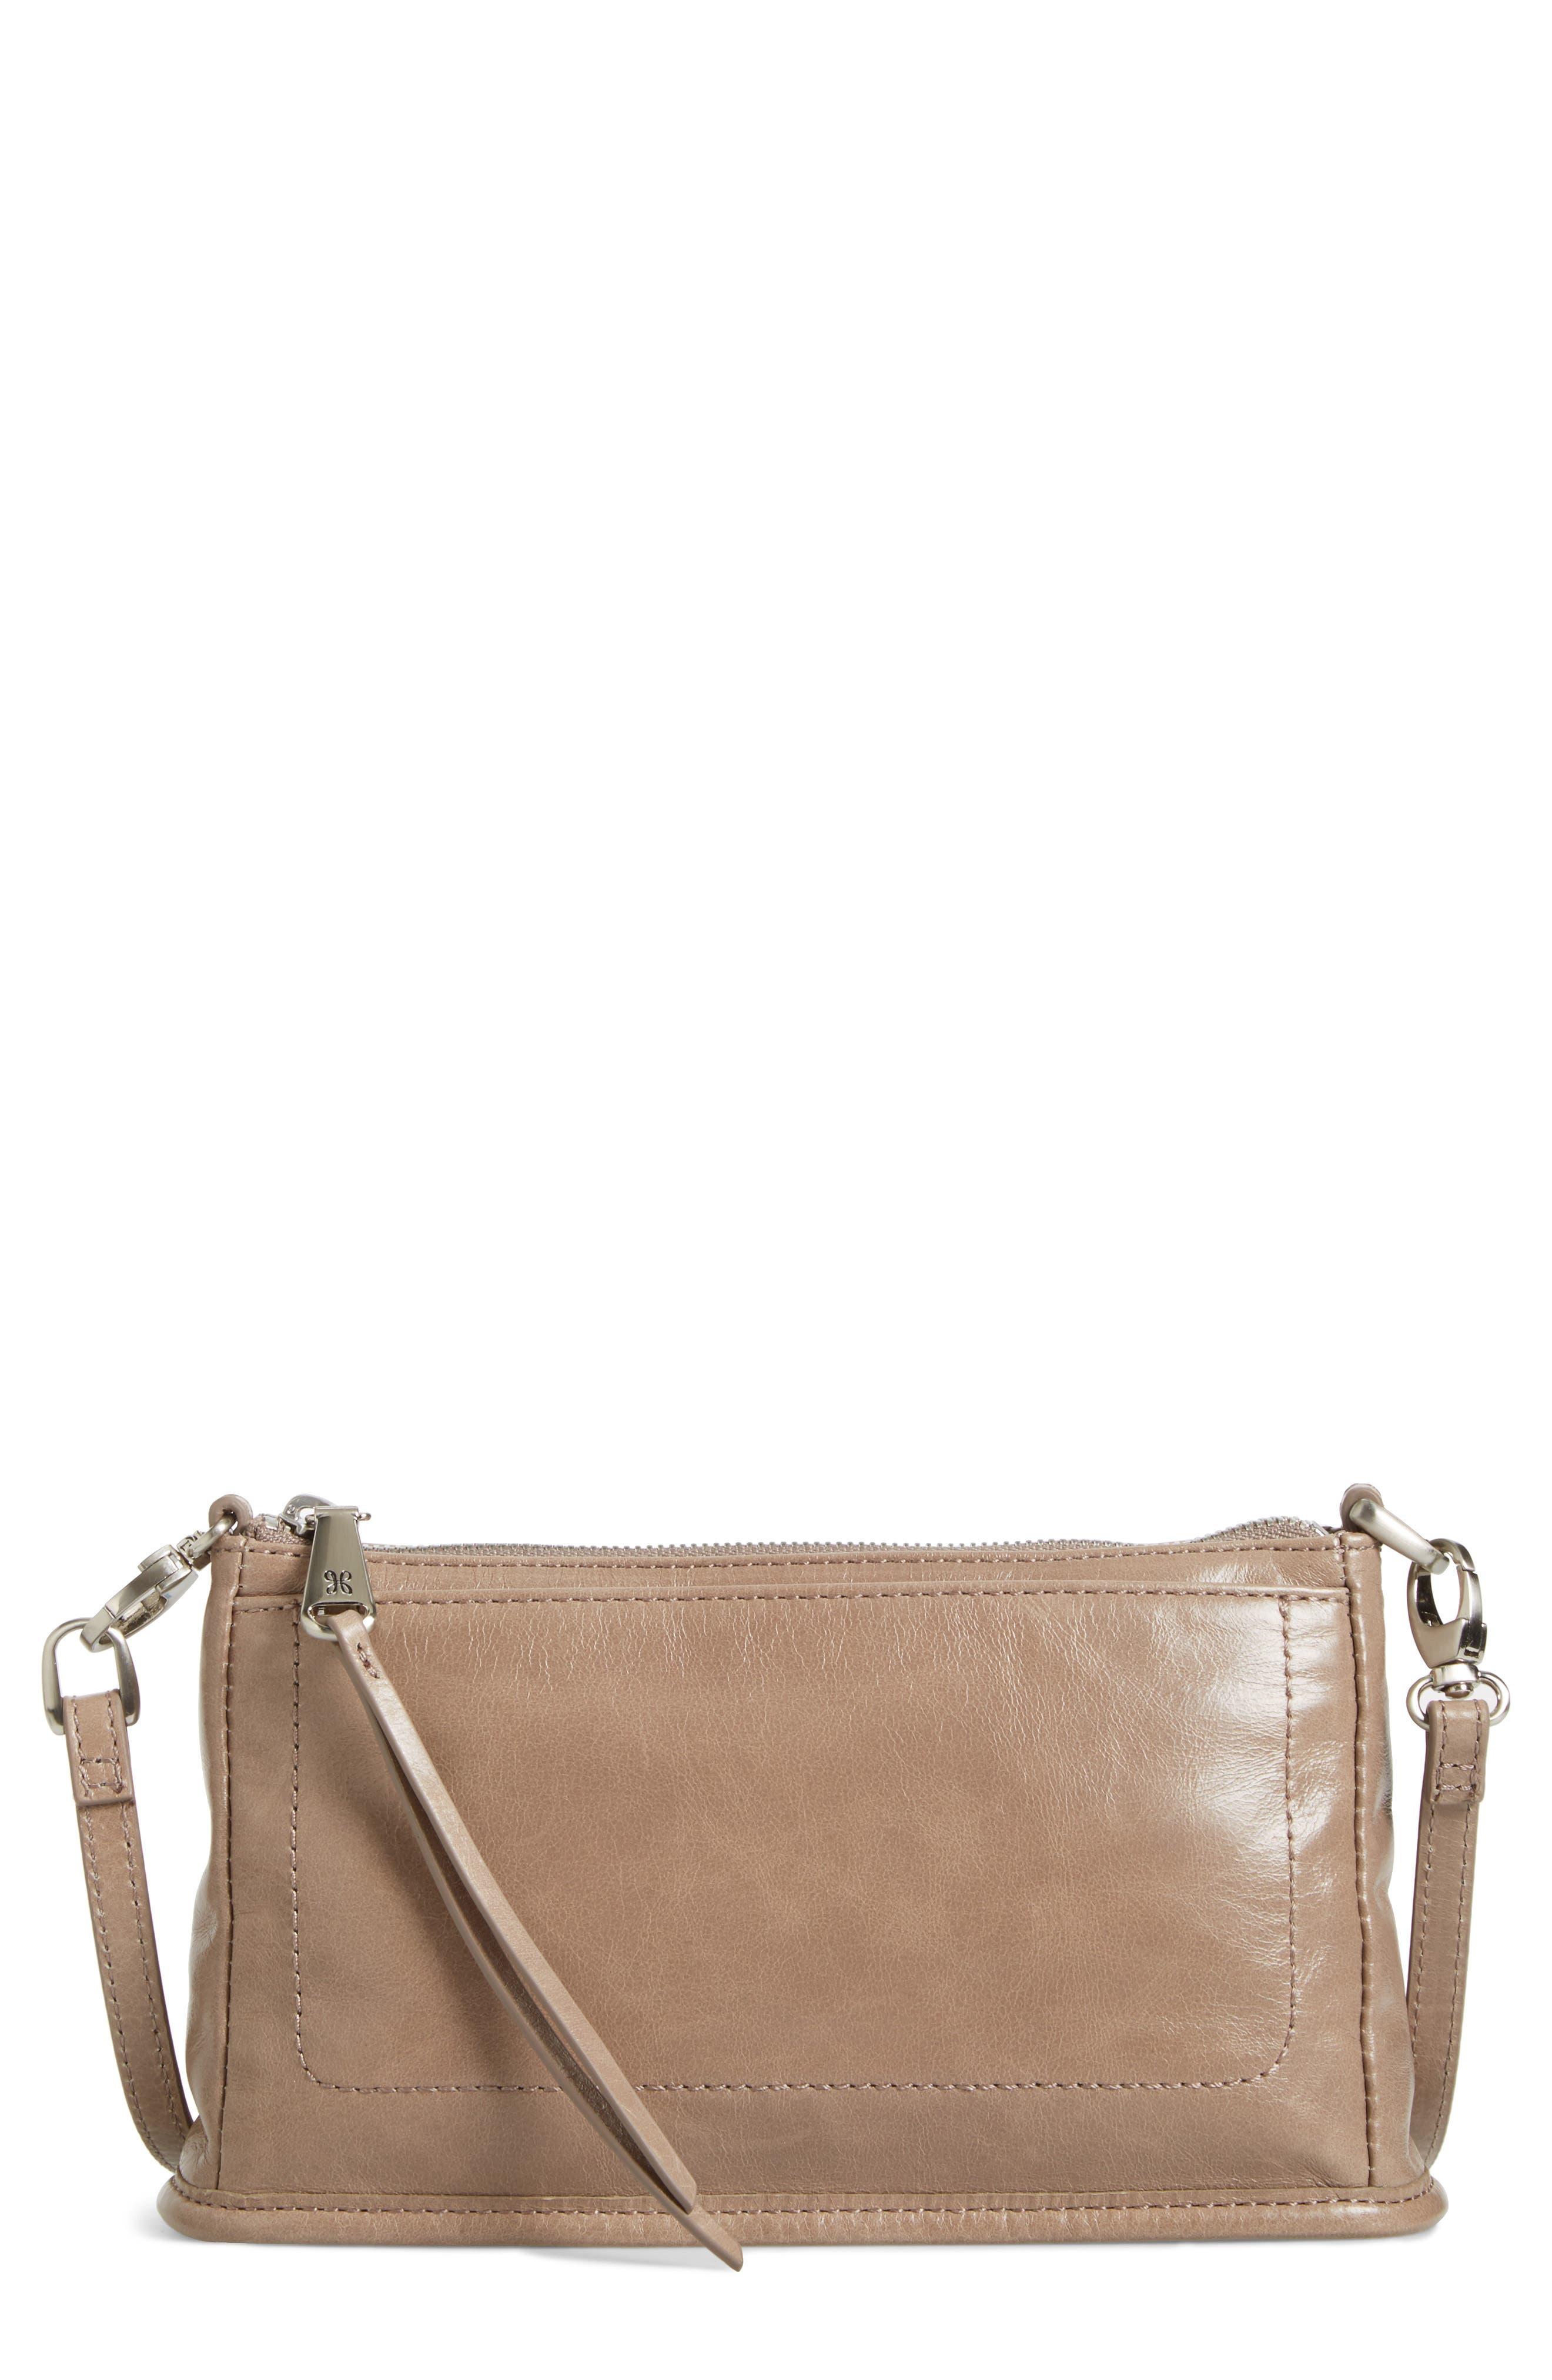 Main Image - Hobo 'Small Cadence' Leather Crossbody Bag